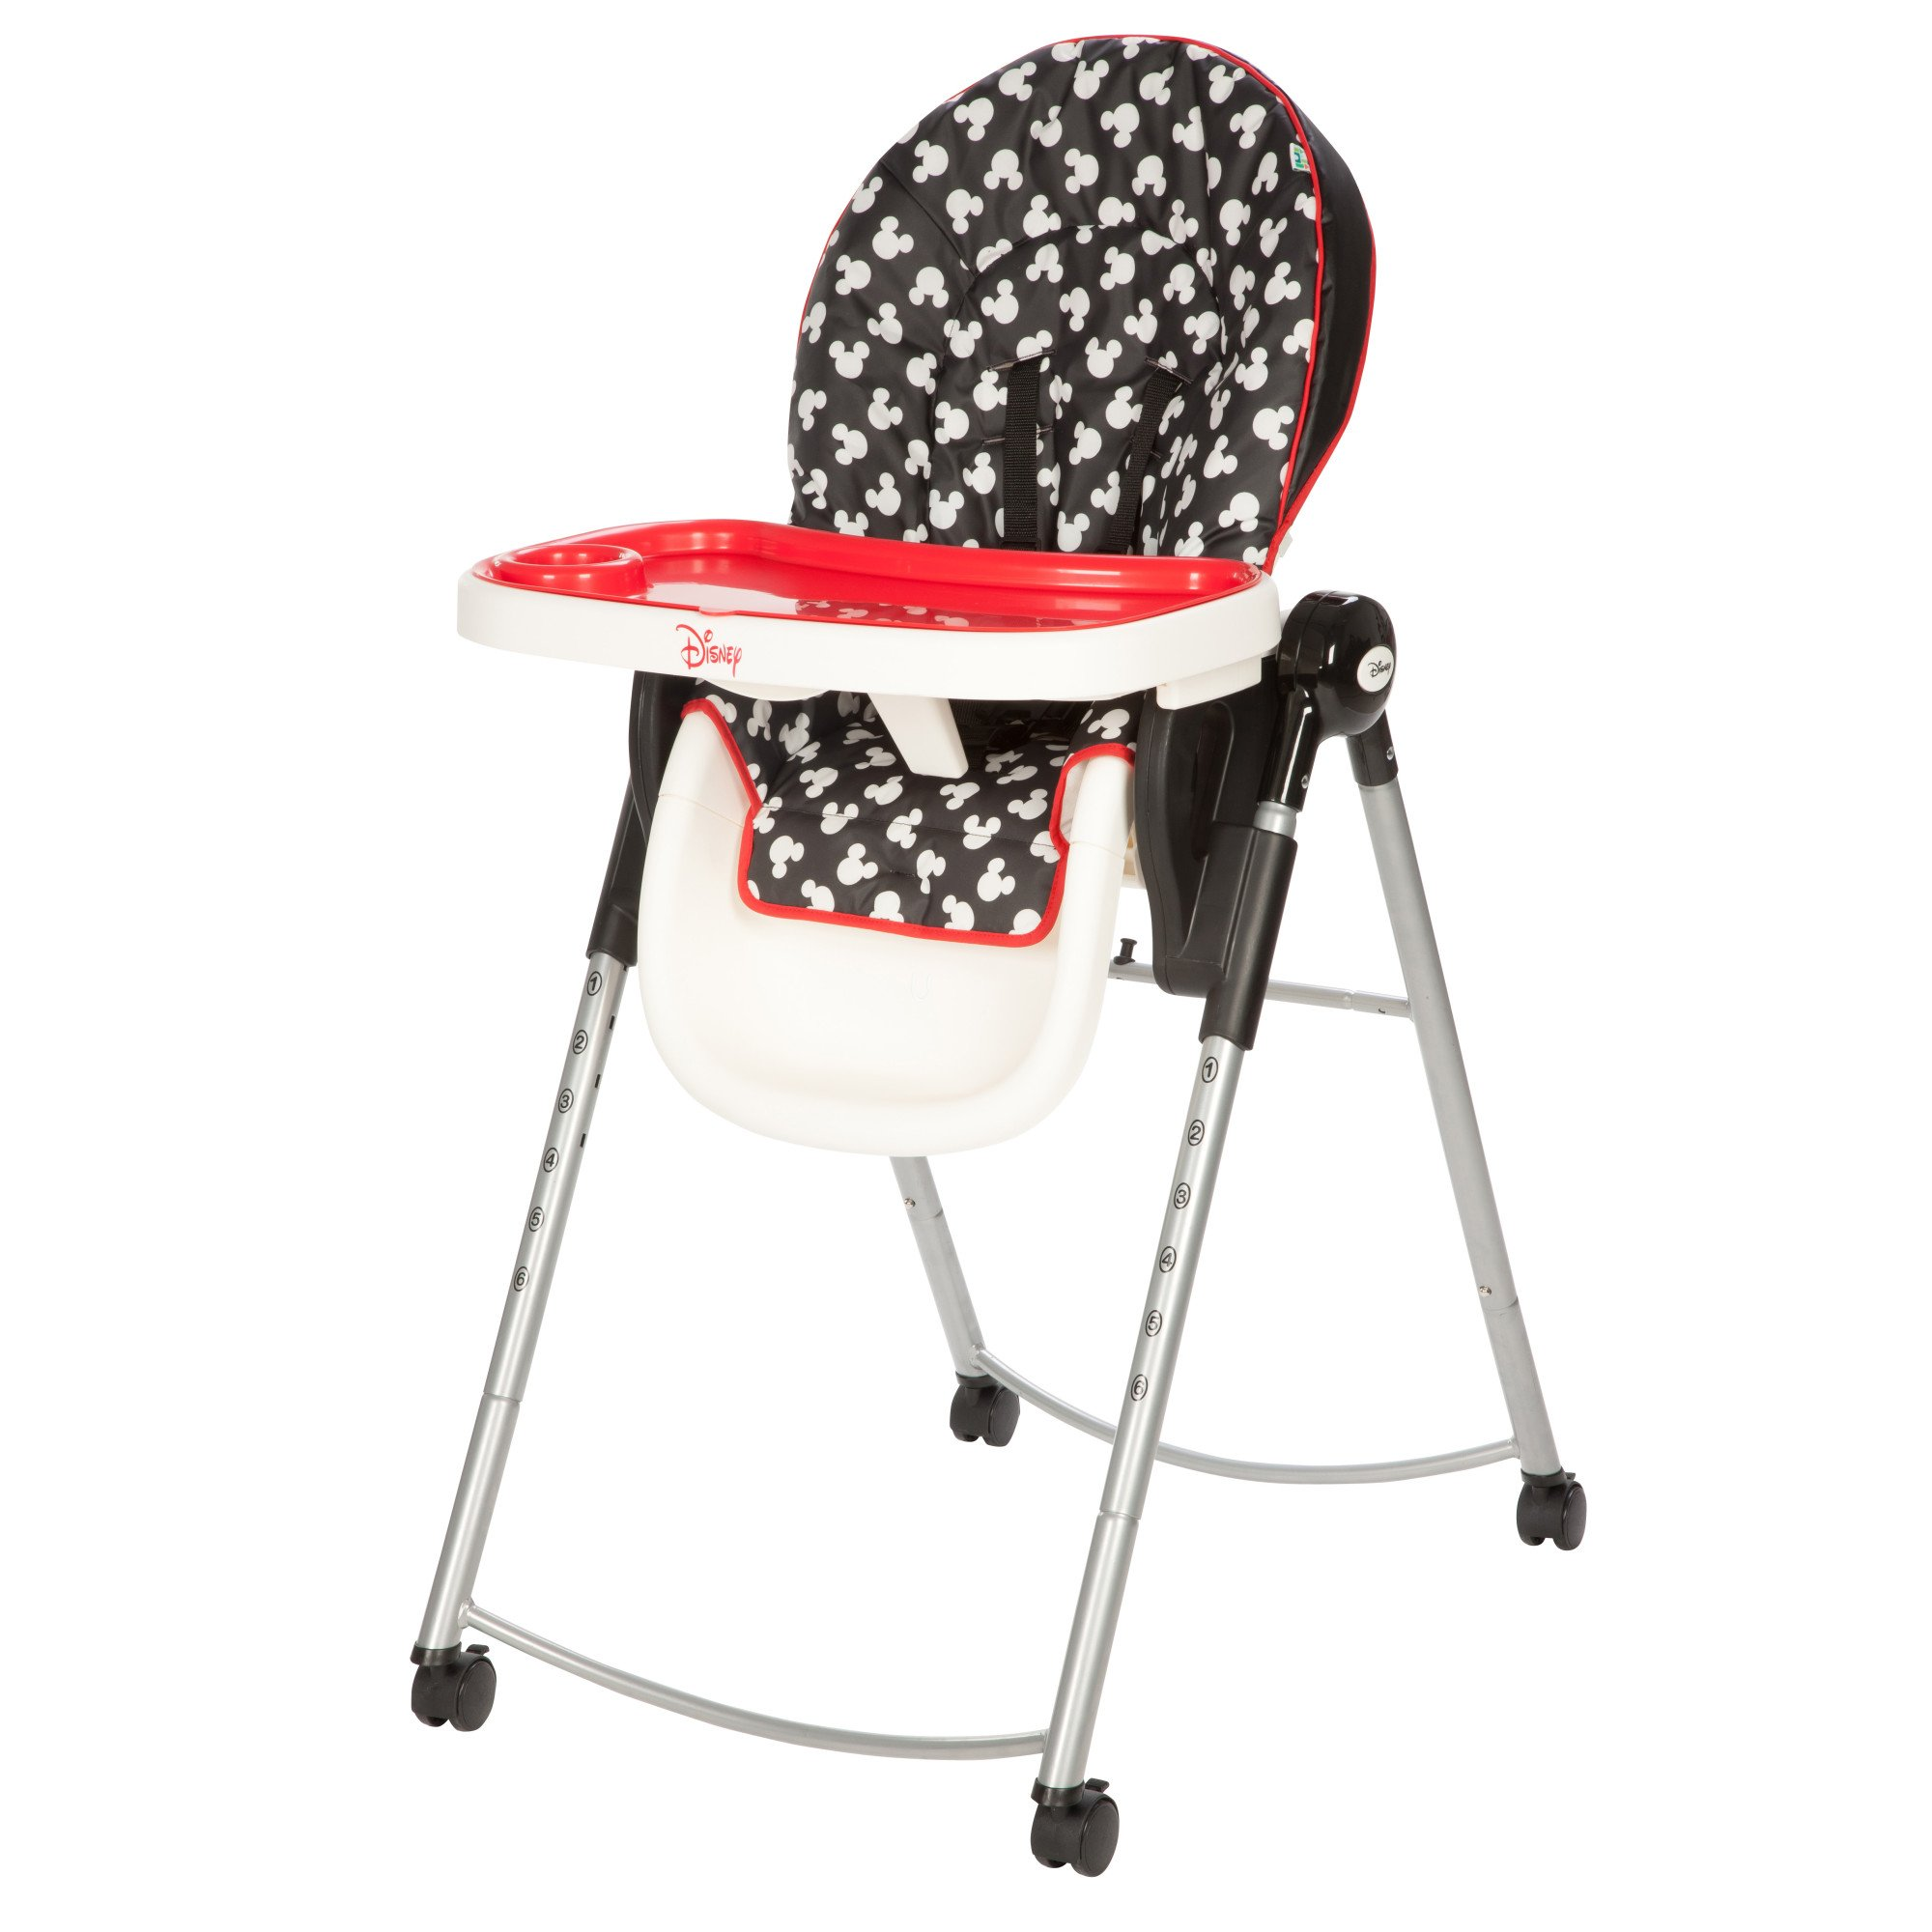 Disney Adjustable High Chair, Mickey Silhouette